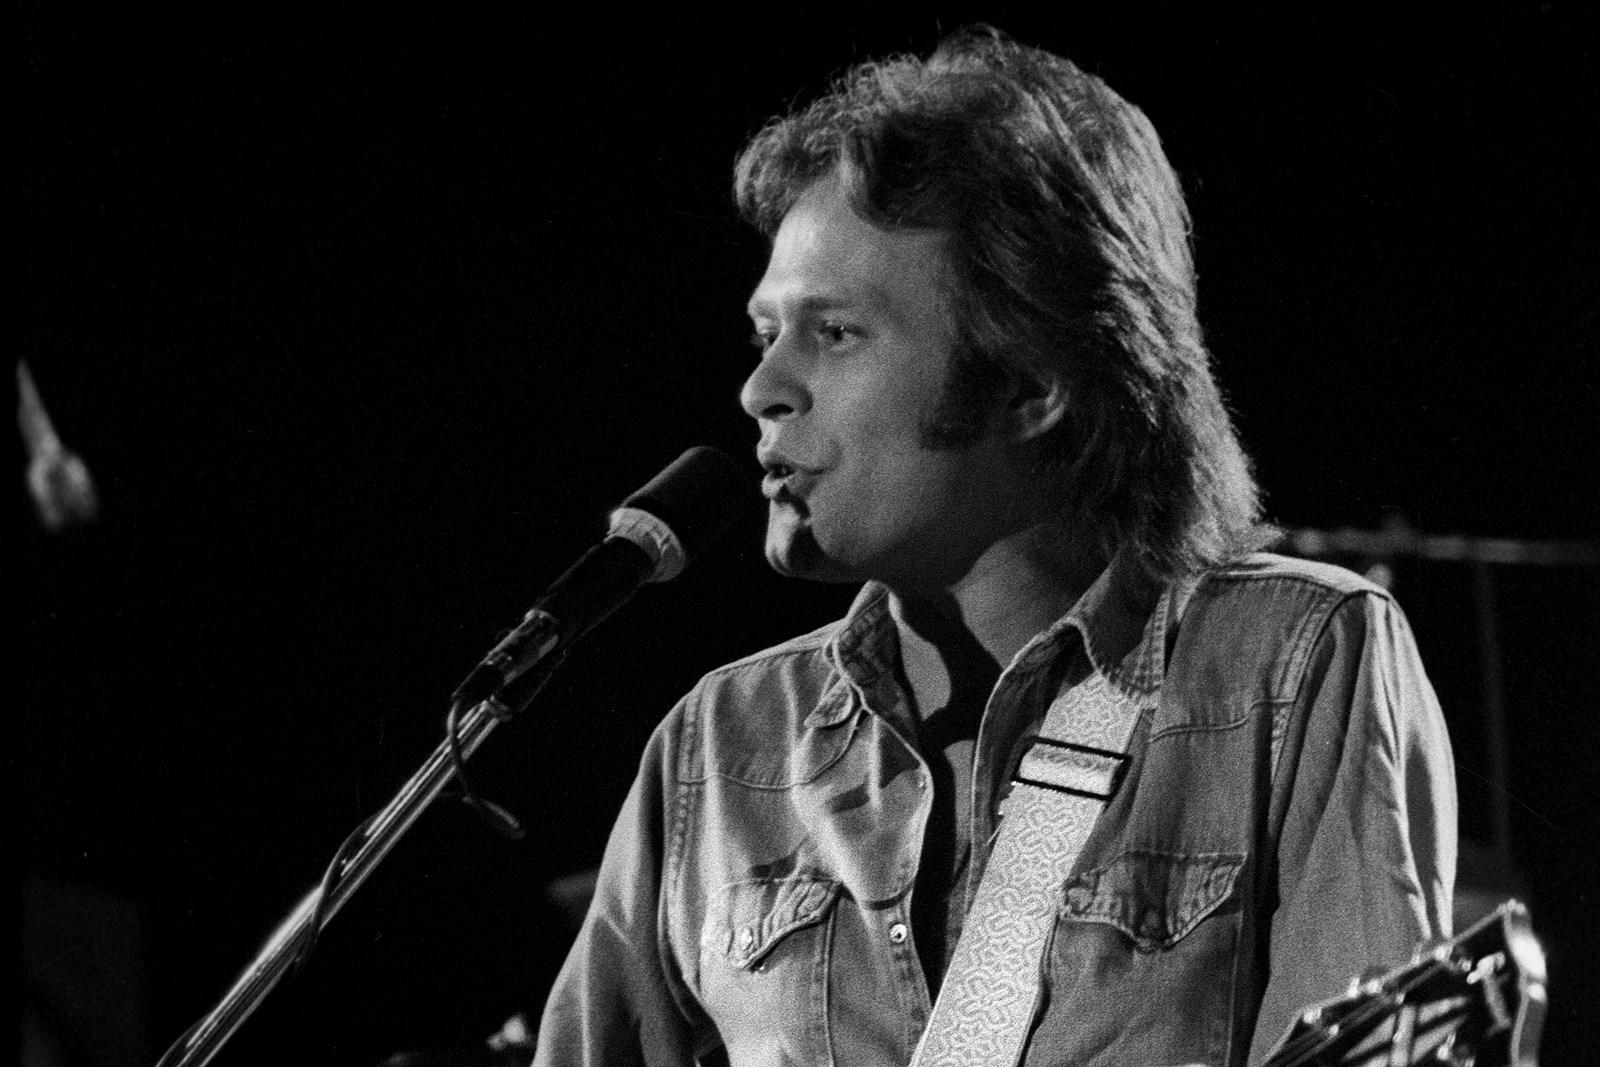 Paul Cotton, Poco Guitarist and Singer, Dies at 78